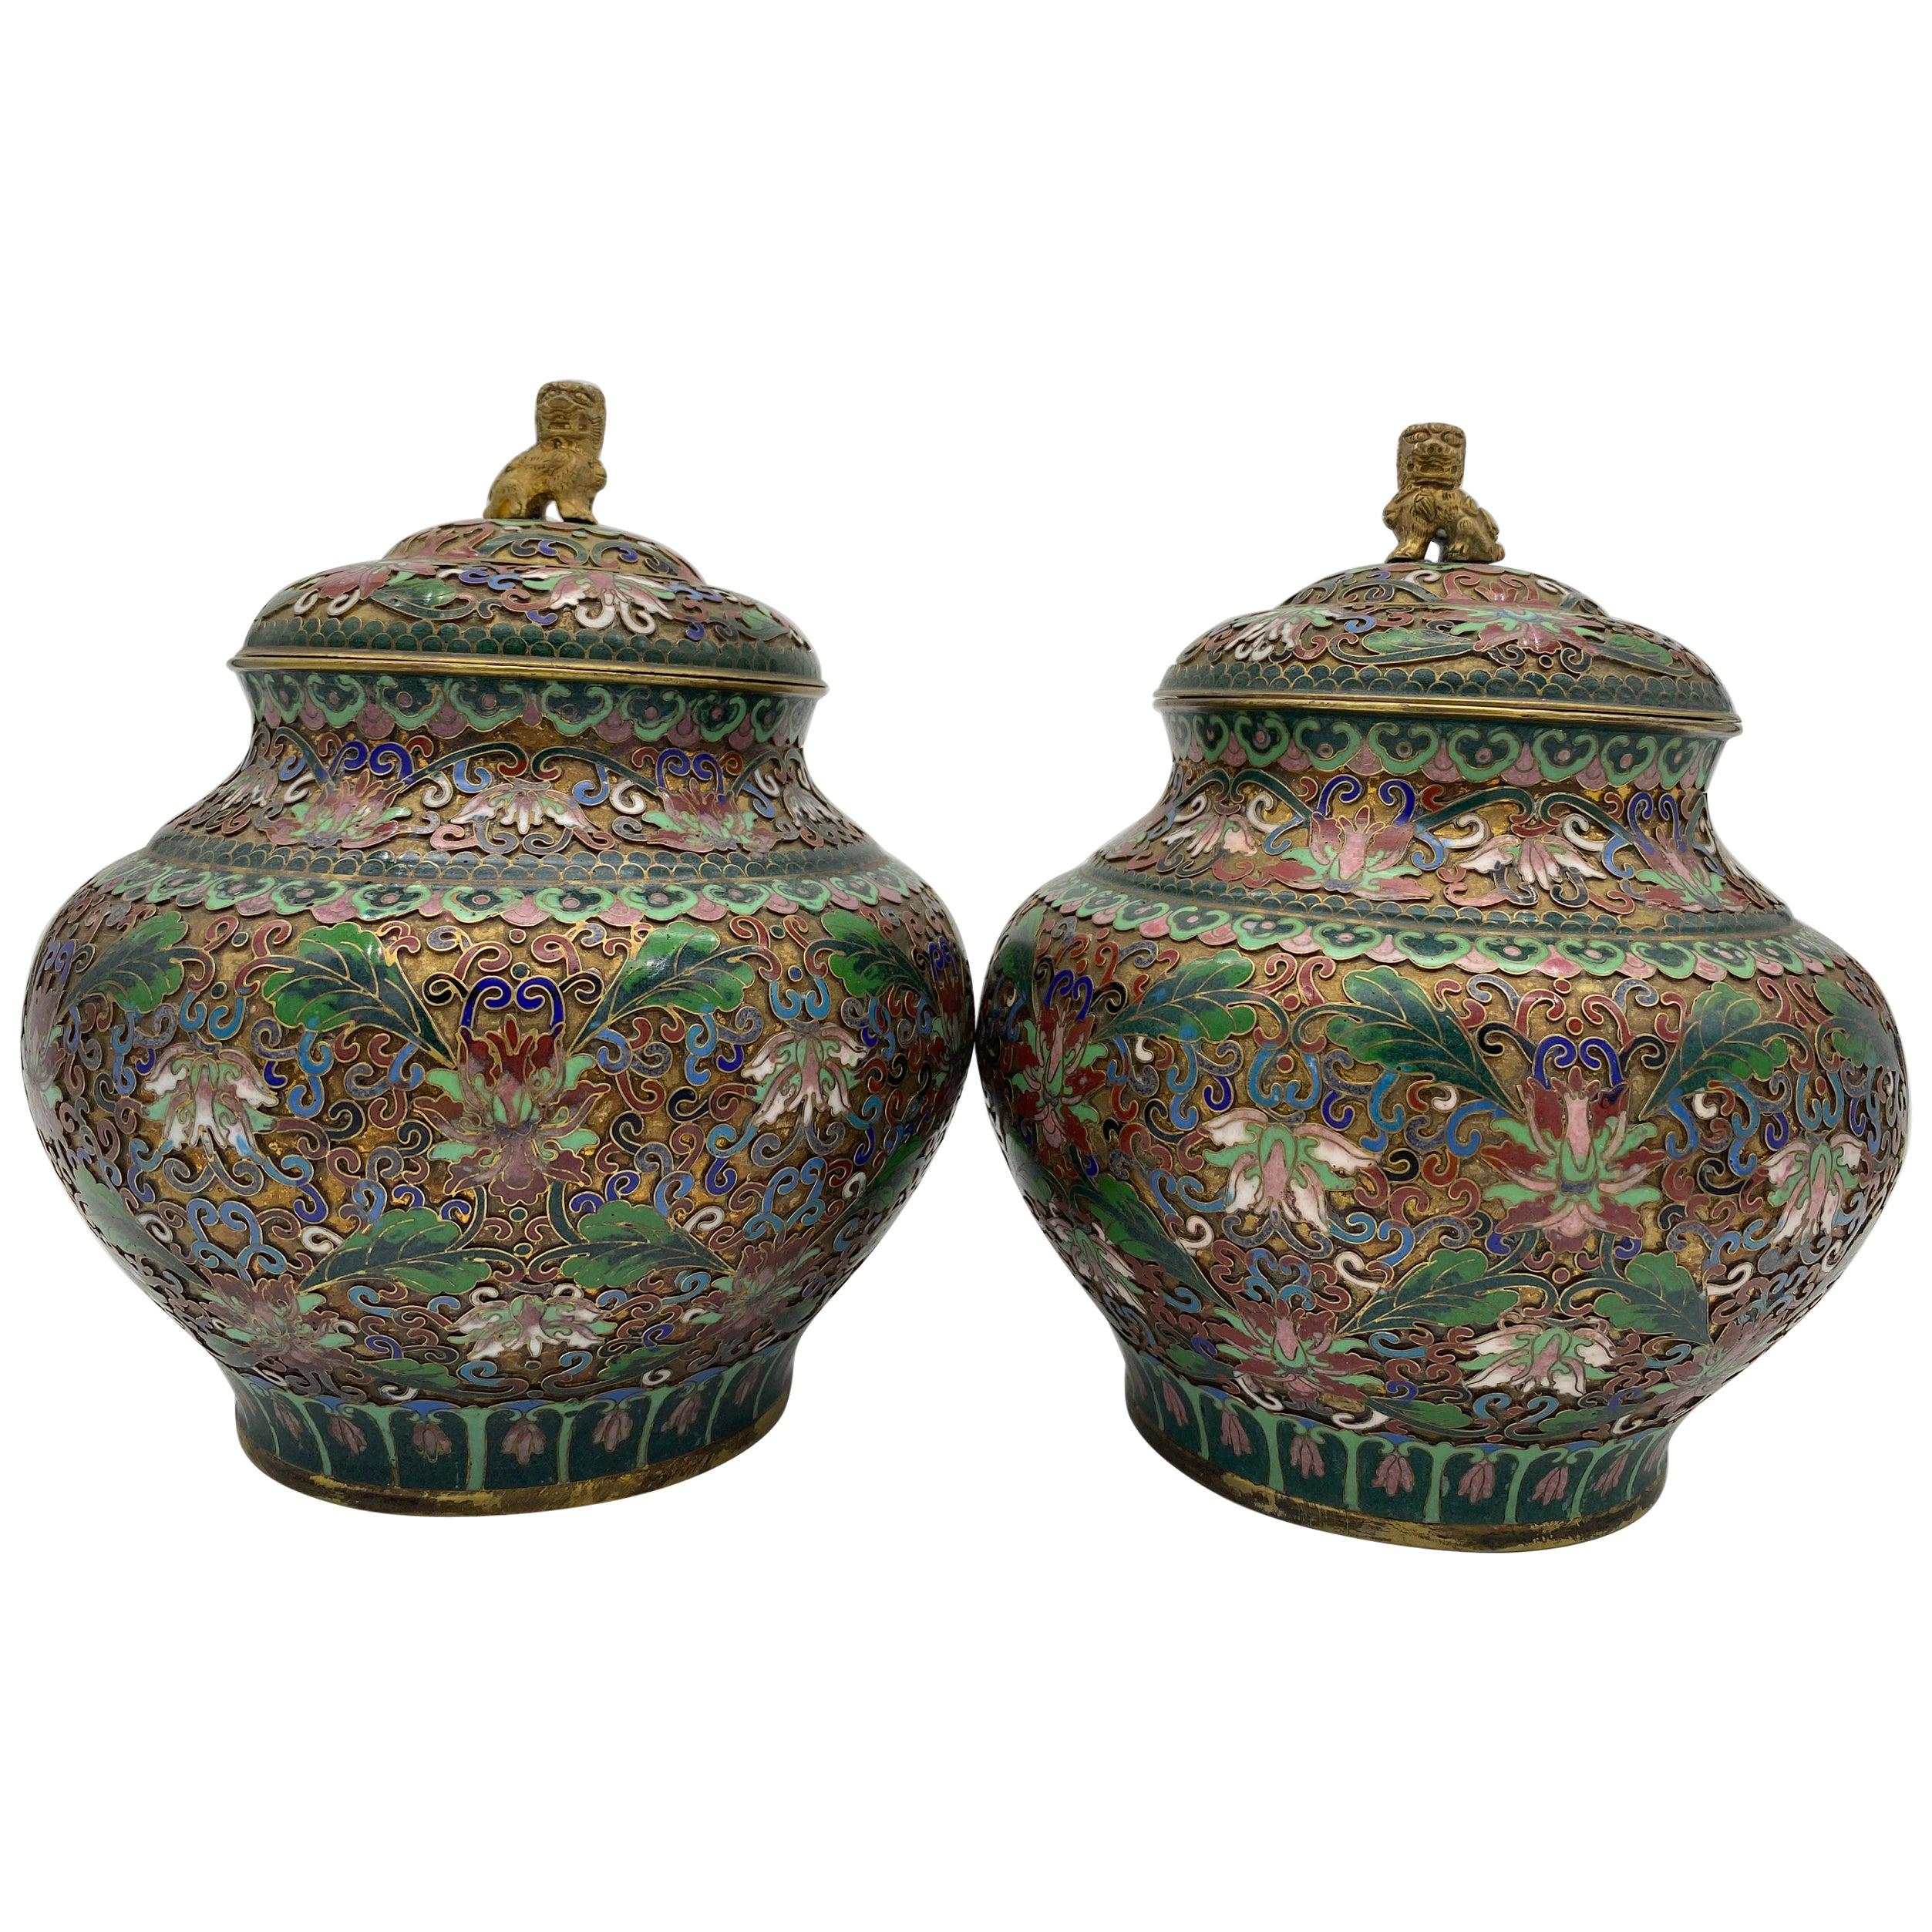 Pair of Chinese Cloisonné Enamel Lidded Open Work Ginger Jars